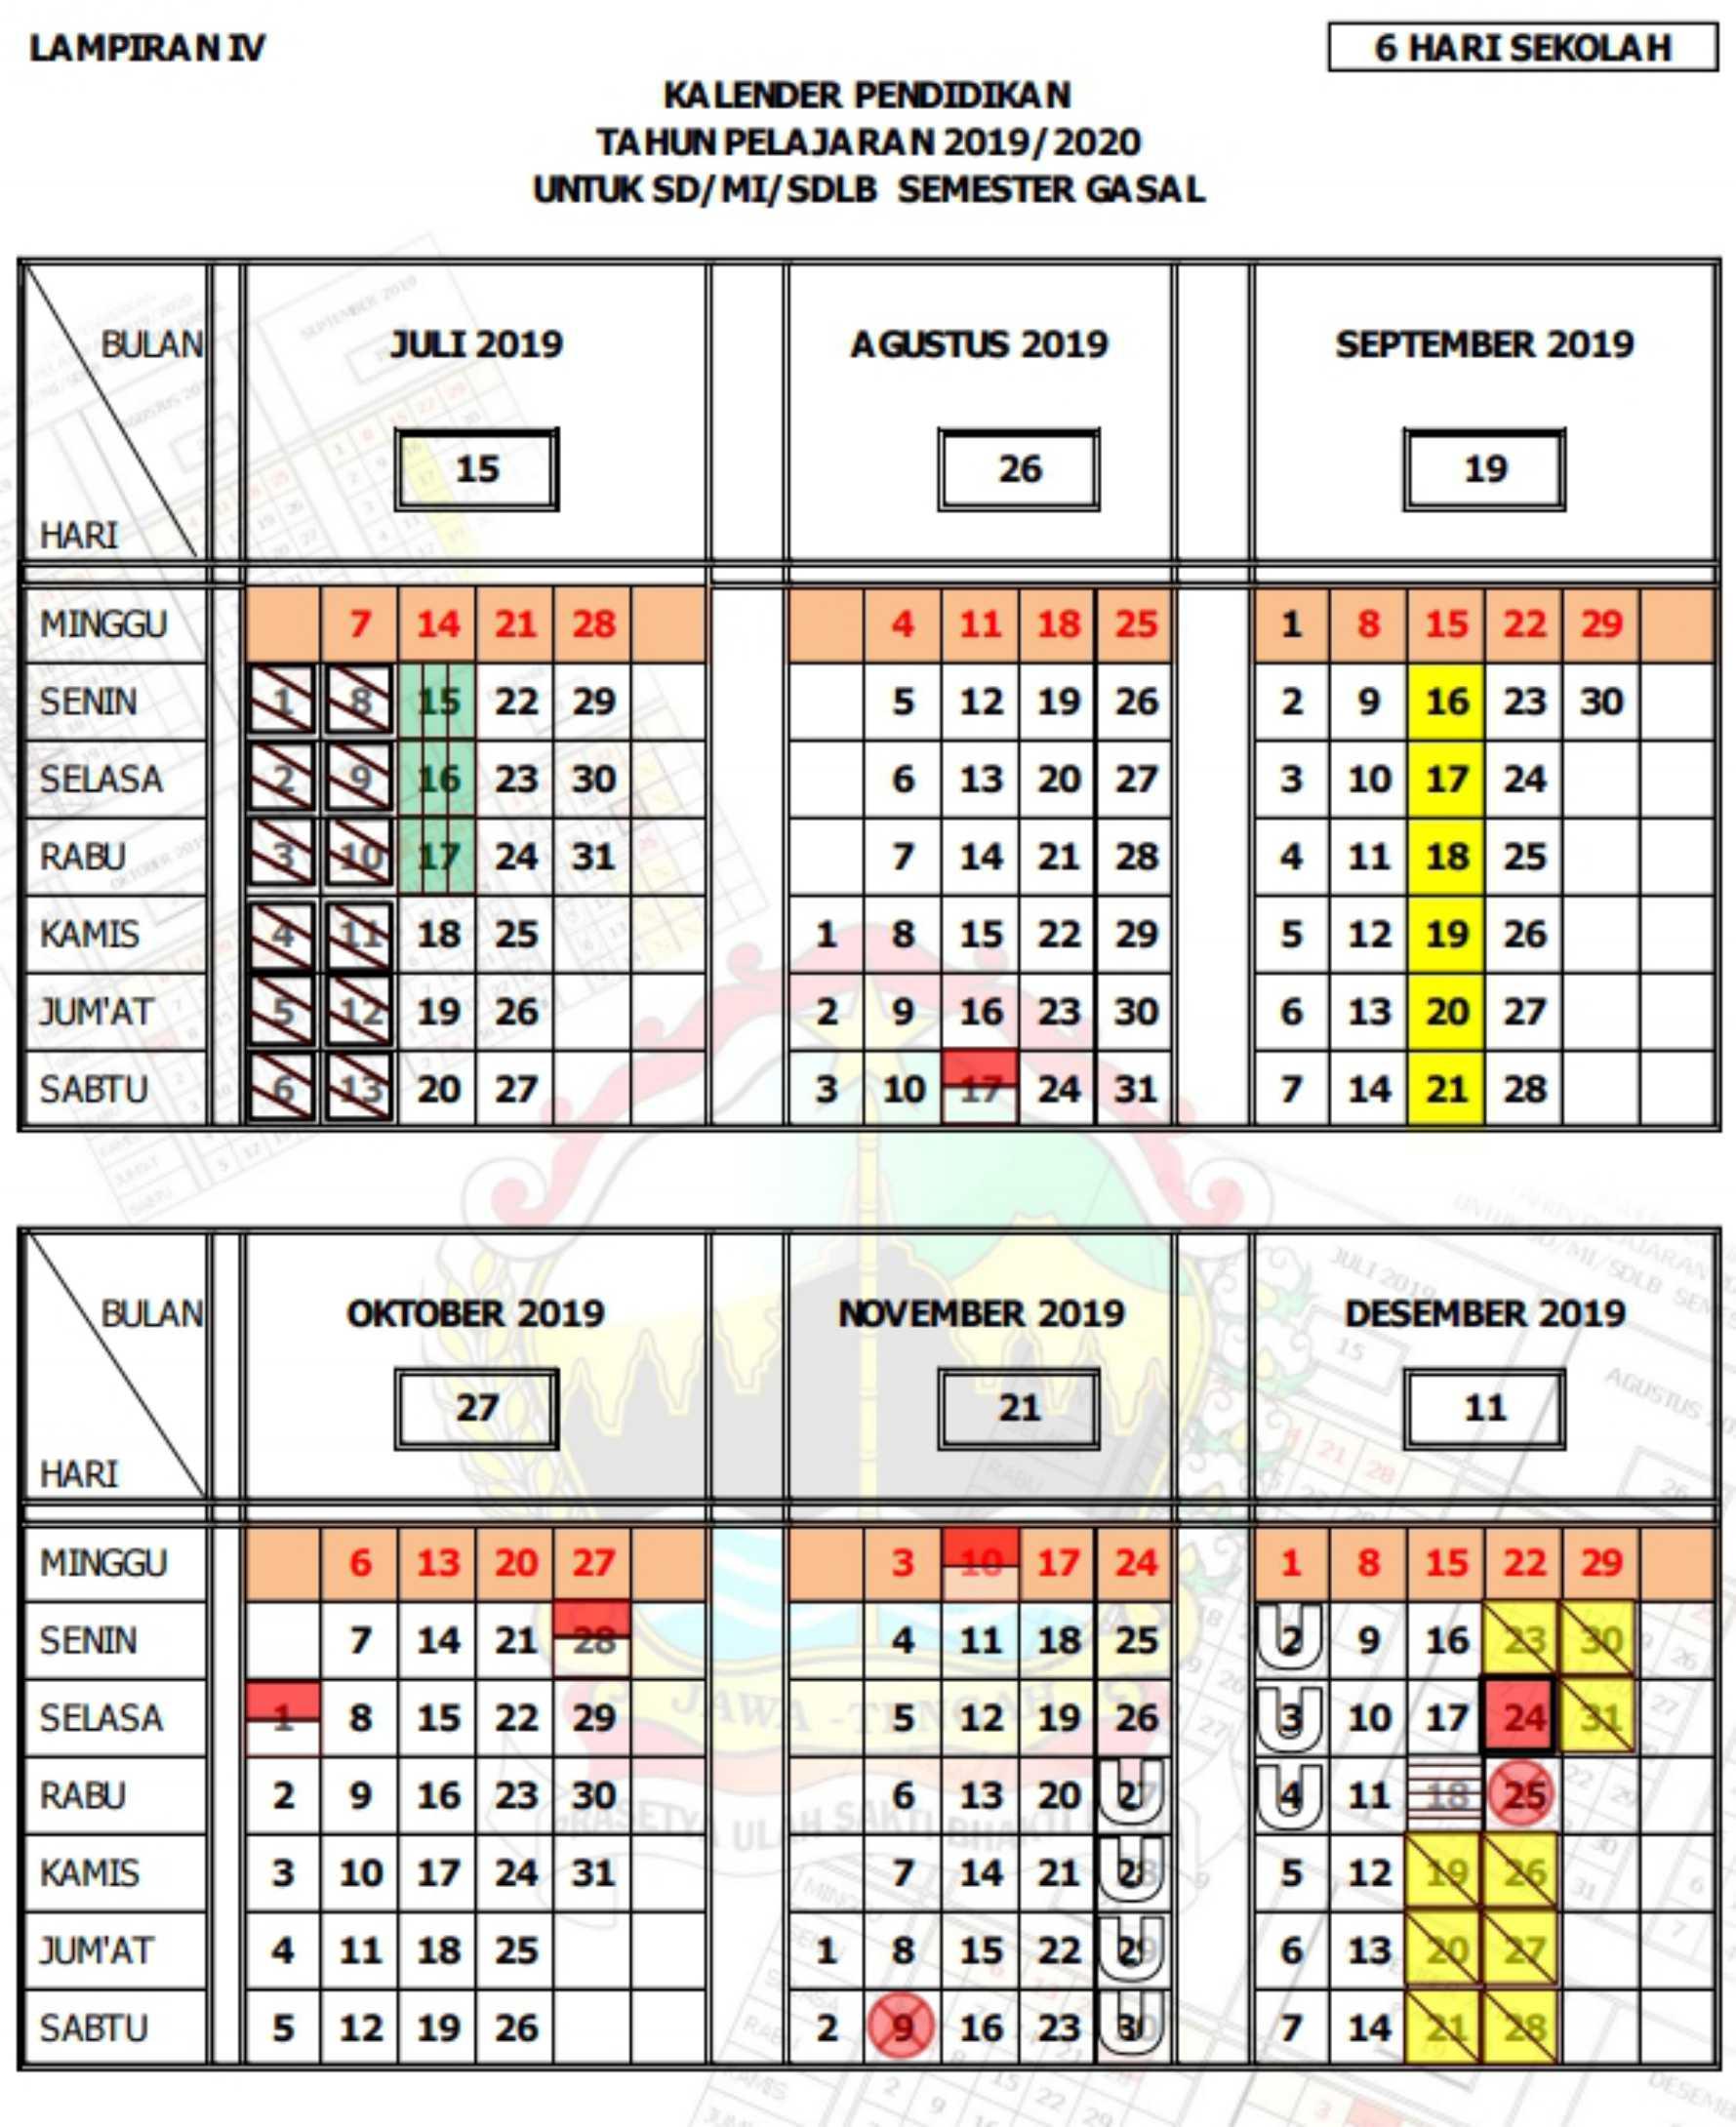 uraian kalender pendidikan tahun pelajaran 2019 - 2020 semester gasal (ganjil) SD SDLB MI (6 hari sekolah) provinsi jawa tengah